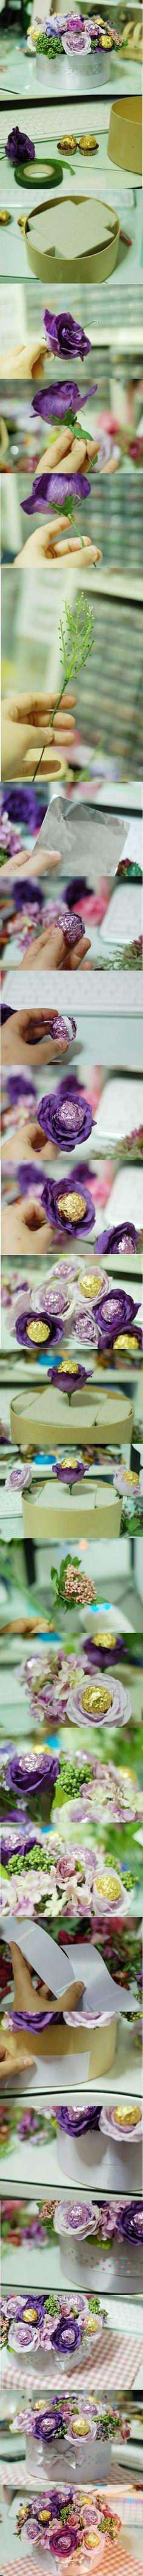 DIY Valentine's Day Chocolate Flower Bouquet | iCreativeIdeas.com LIKE Us on Facebook ==> https://www.facebook.com/icreativeideas